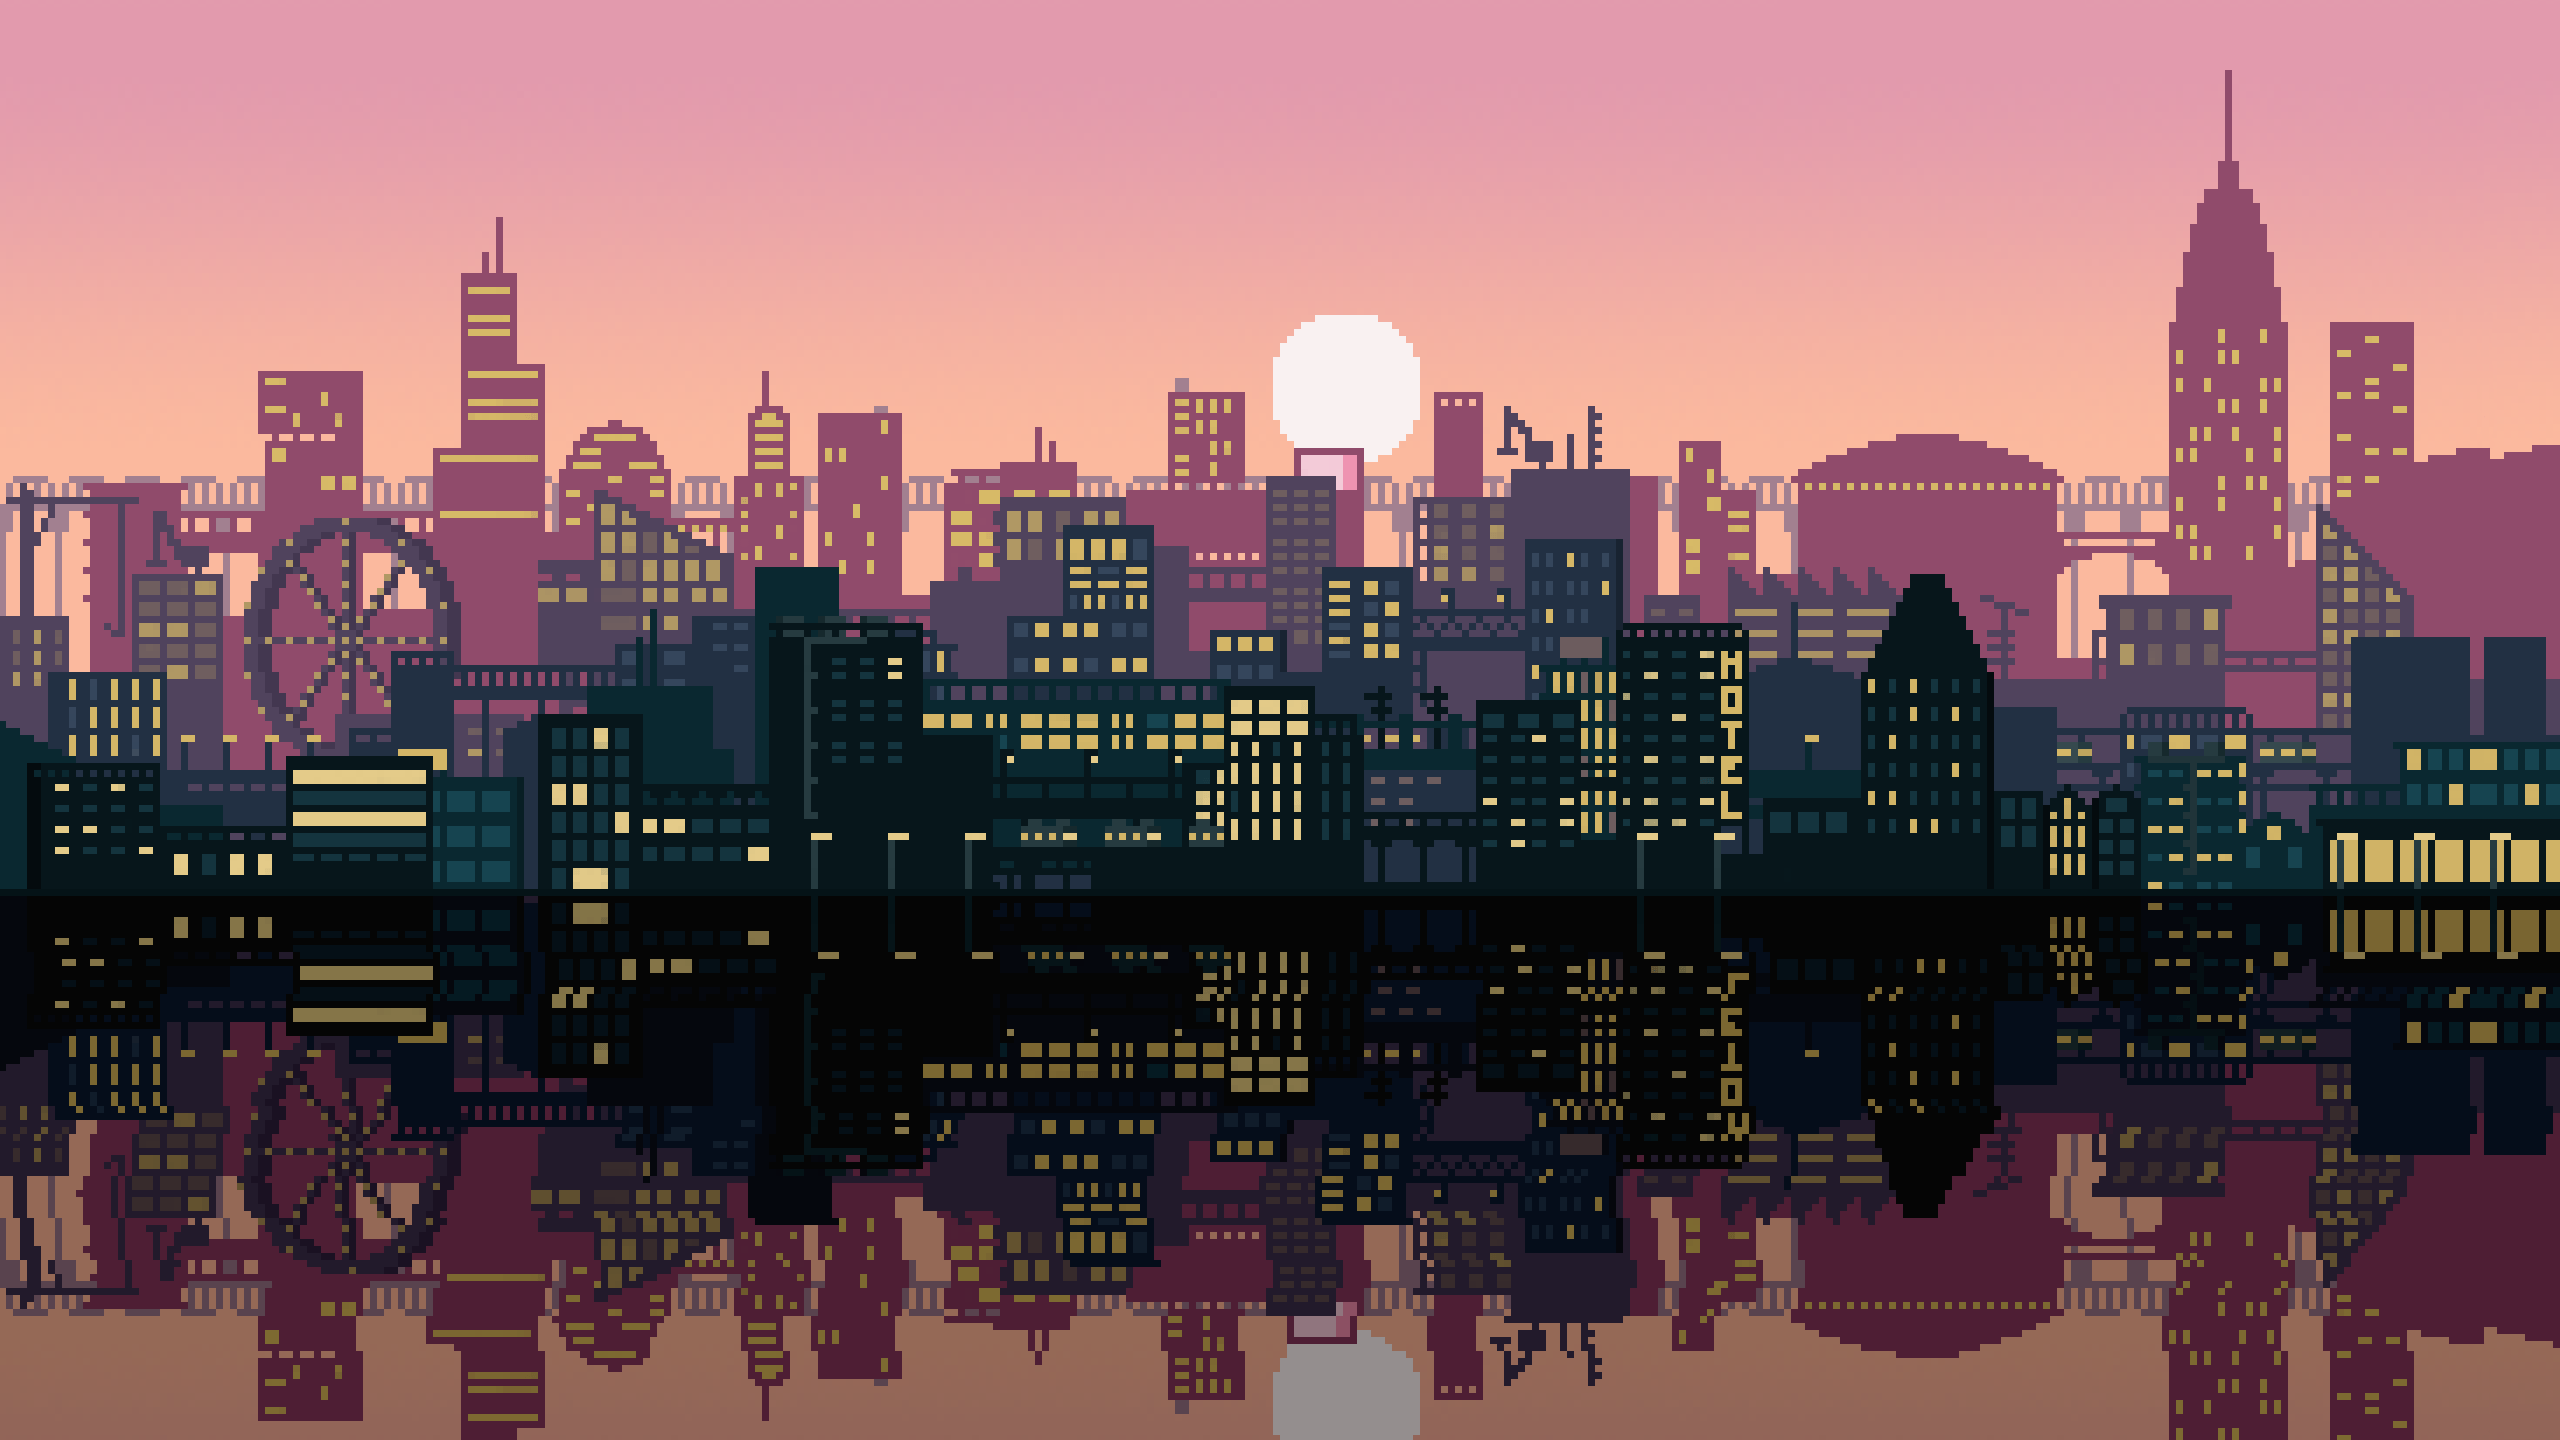 City Pixel Art Wallpapers Top Free City Pixel Art Backgrounds Wallpaperaccess